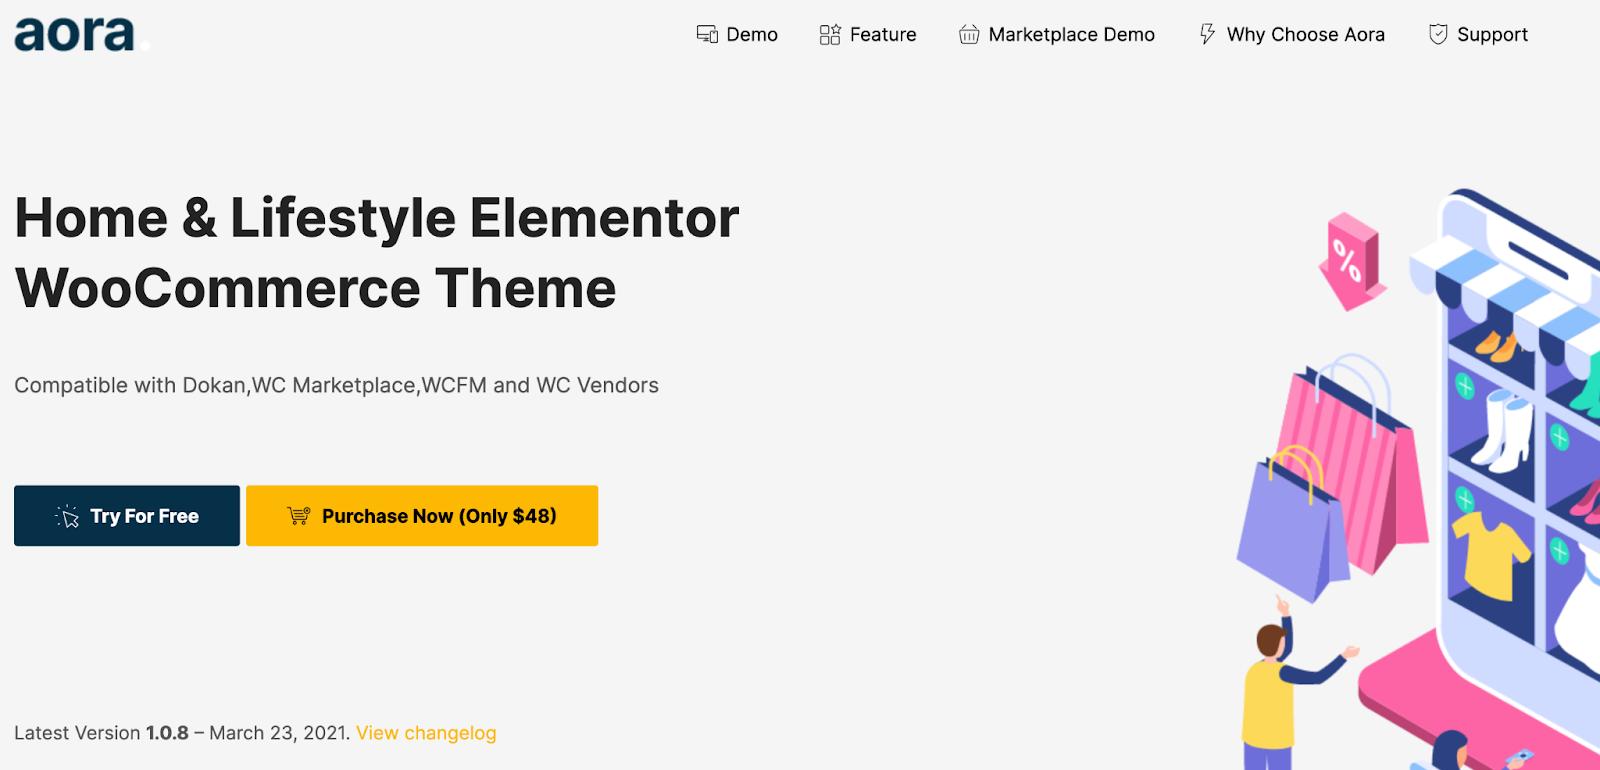 Aora WordPress Marketplace theme homepage featuring the tagline